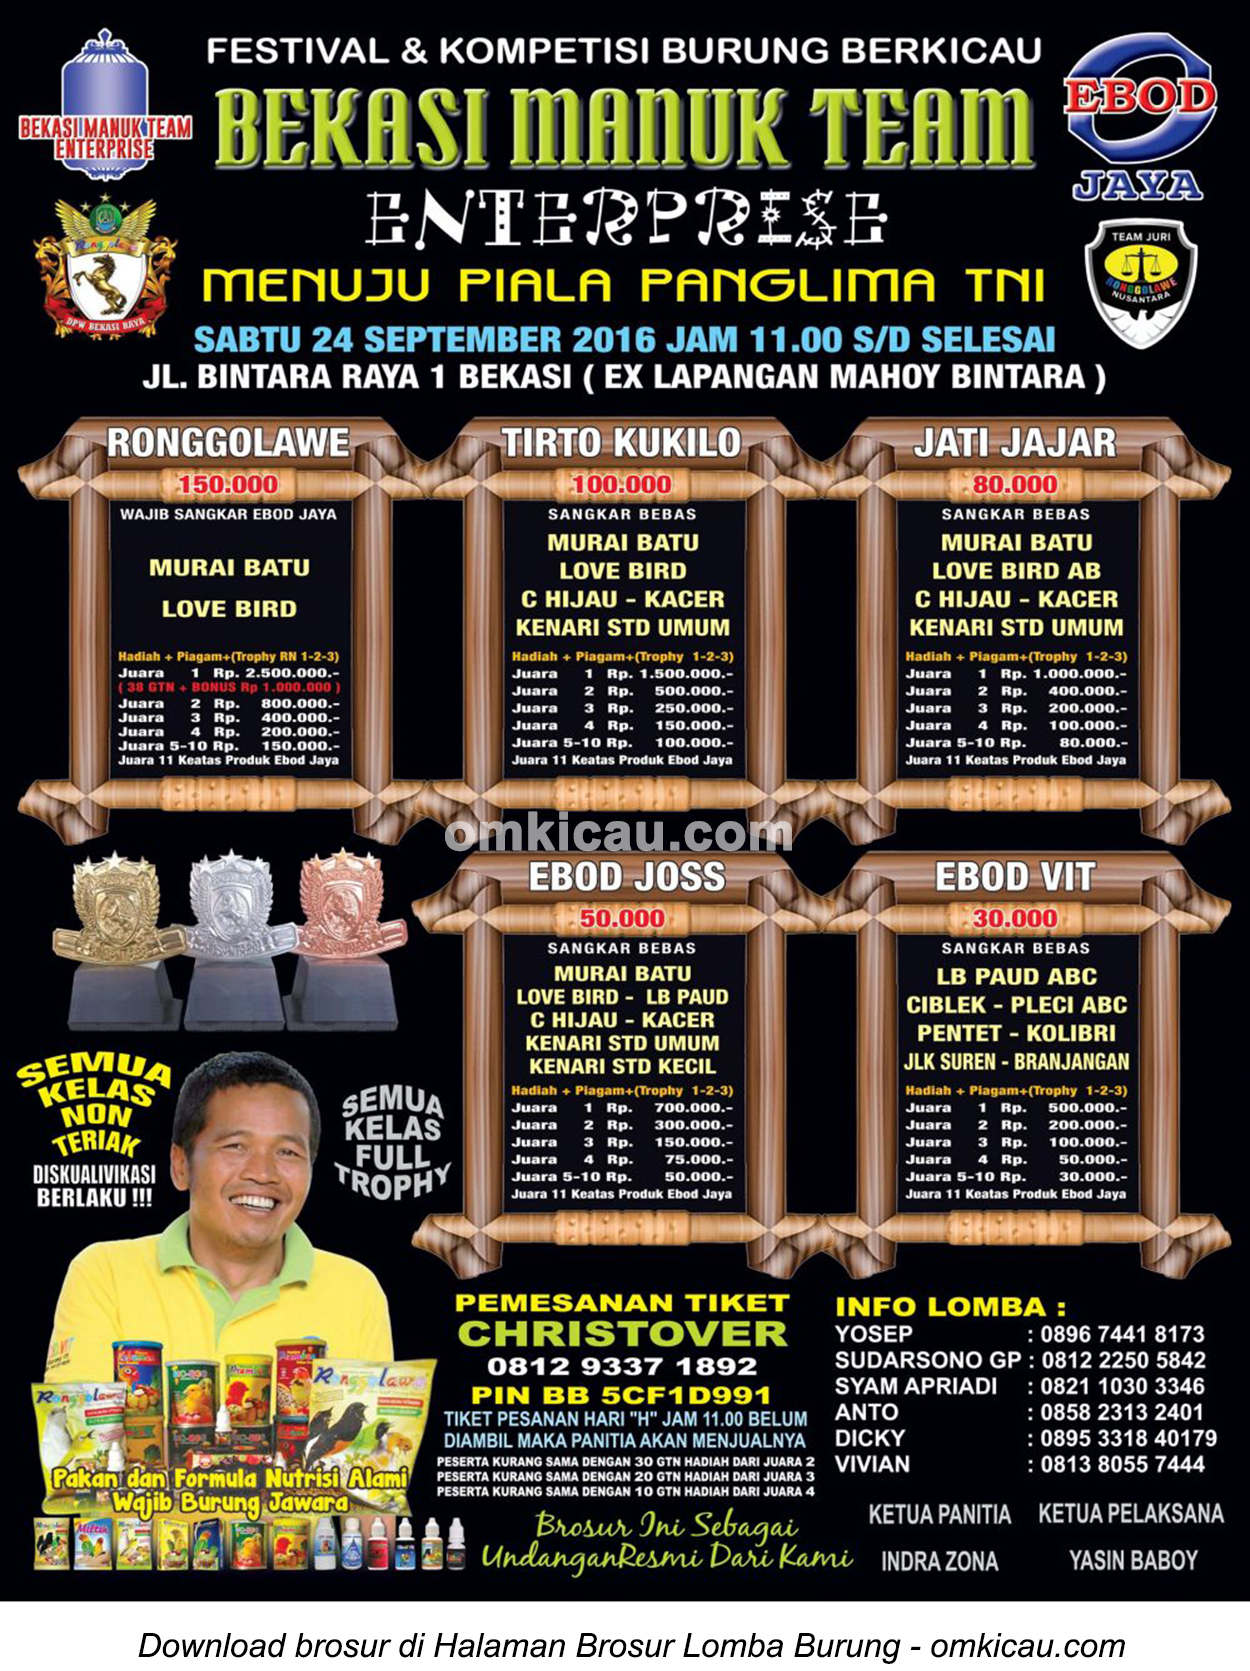 Brosur Lomba Burung Berkicau BMT Enterprise Menuju Piala Panglima TNI, Bekasi, 24 September 2016